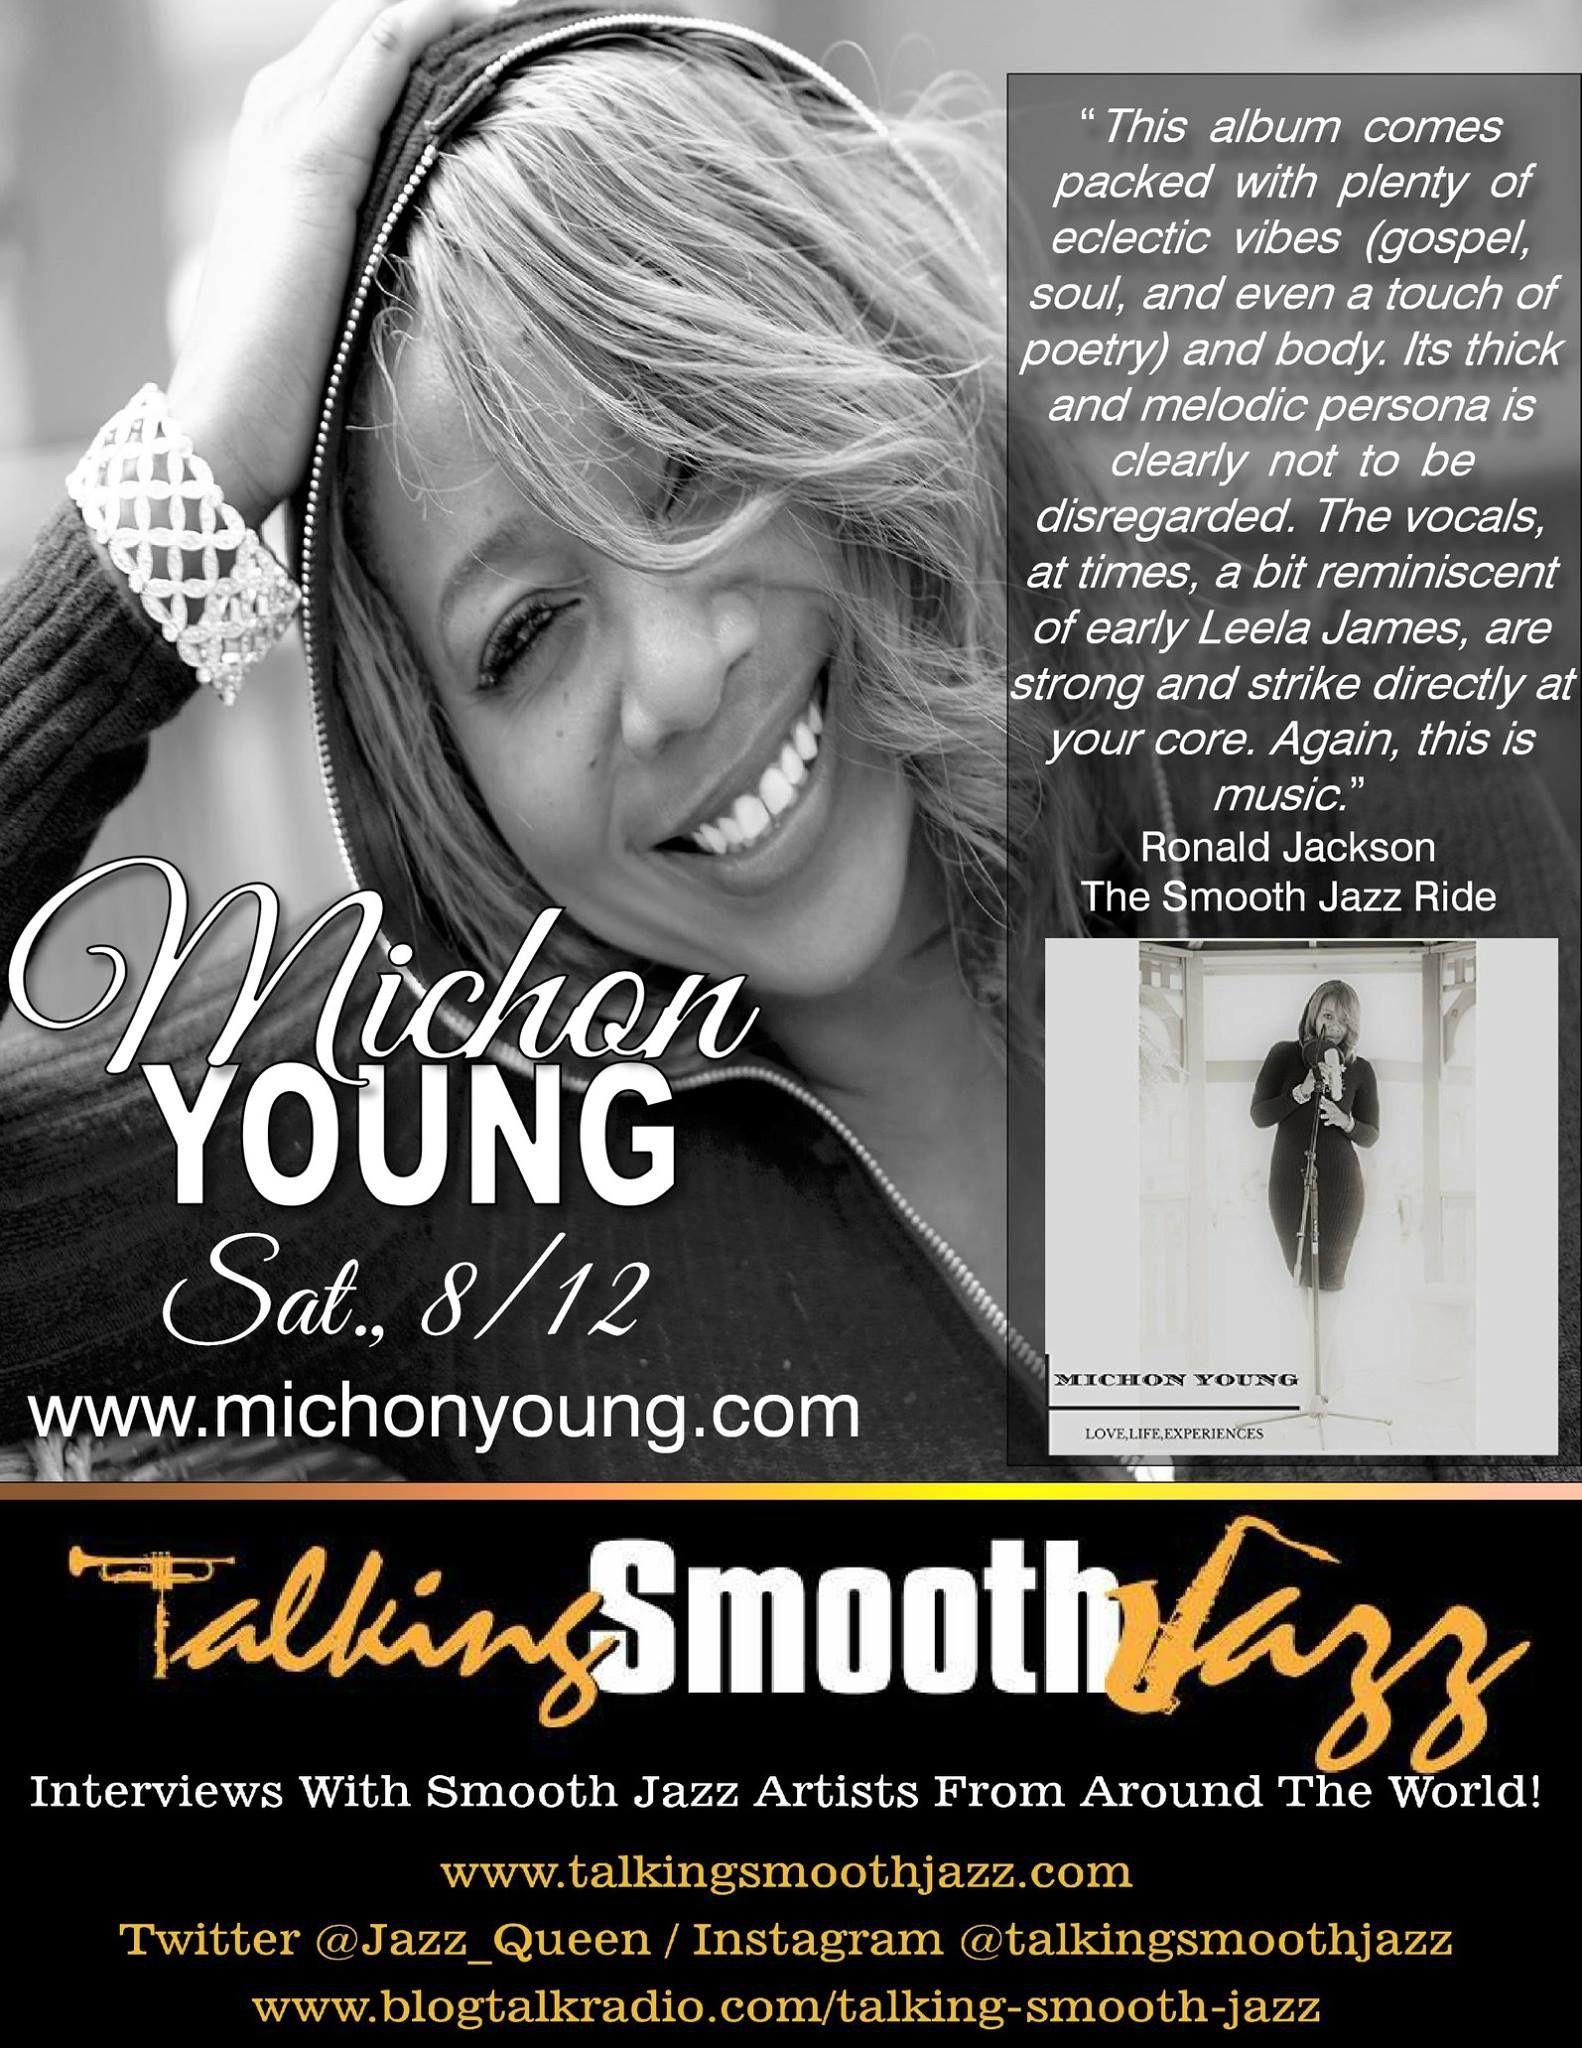 Pin by Talking Smooth Jazz on TALKING SMOOTH JAZZ RADIO SHOW